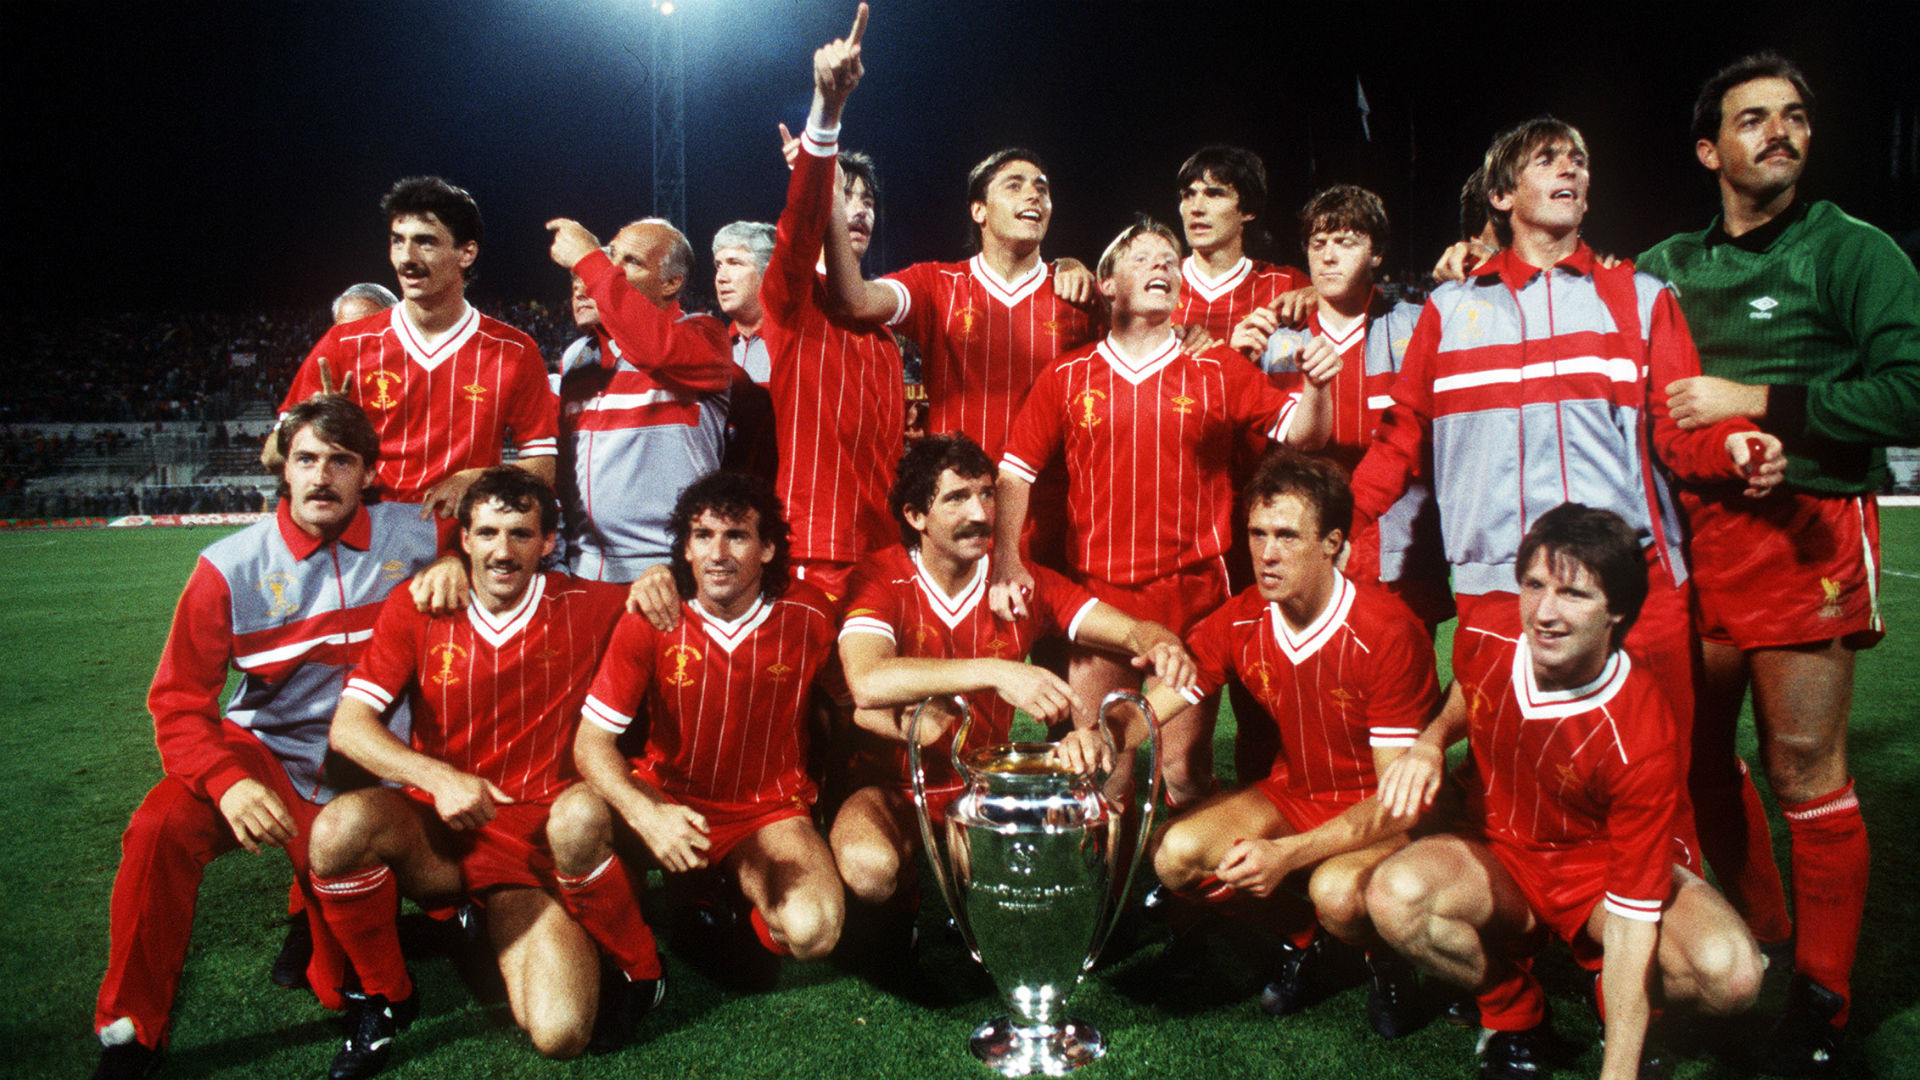 liverpools-european-cup-winning-team-of-1984_1eyopkz9urcv01ca3eoumhjf8d.jpg